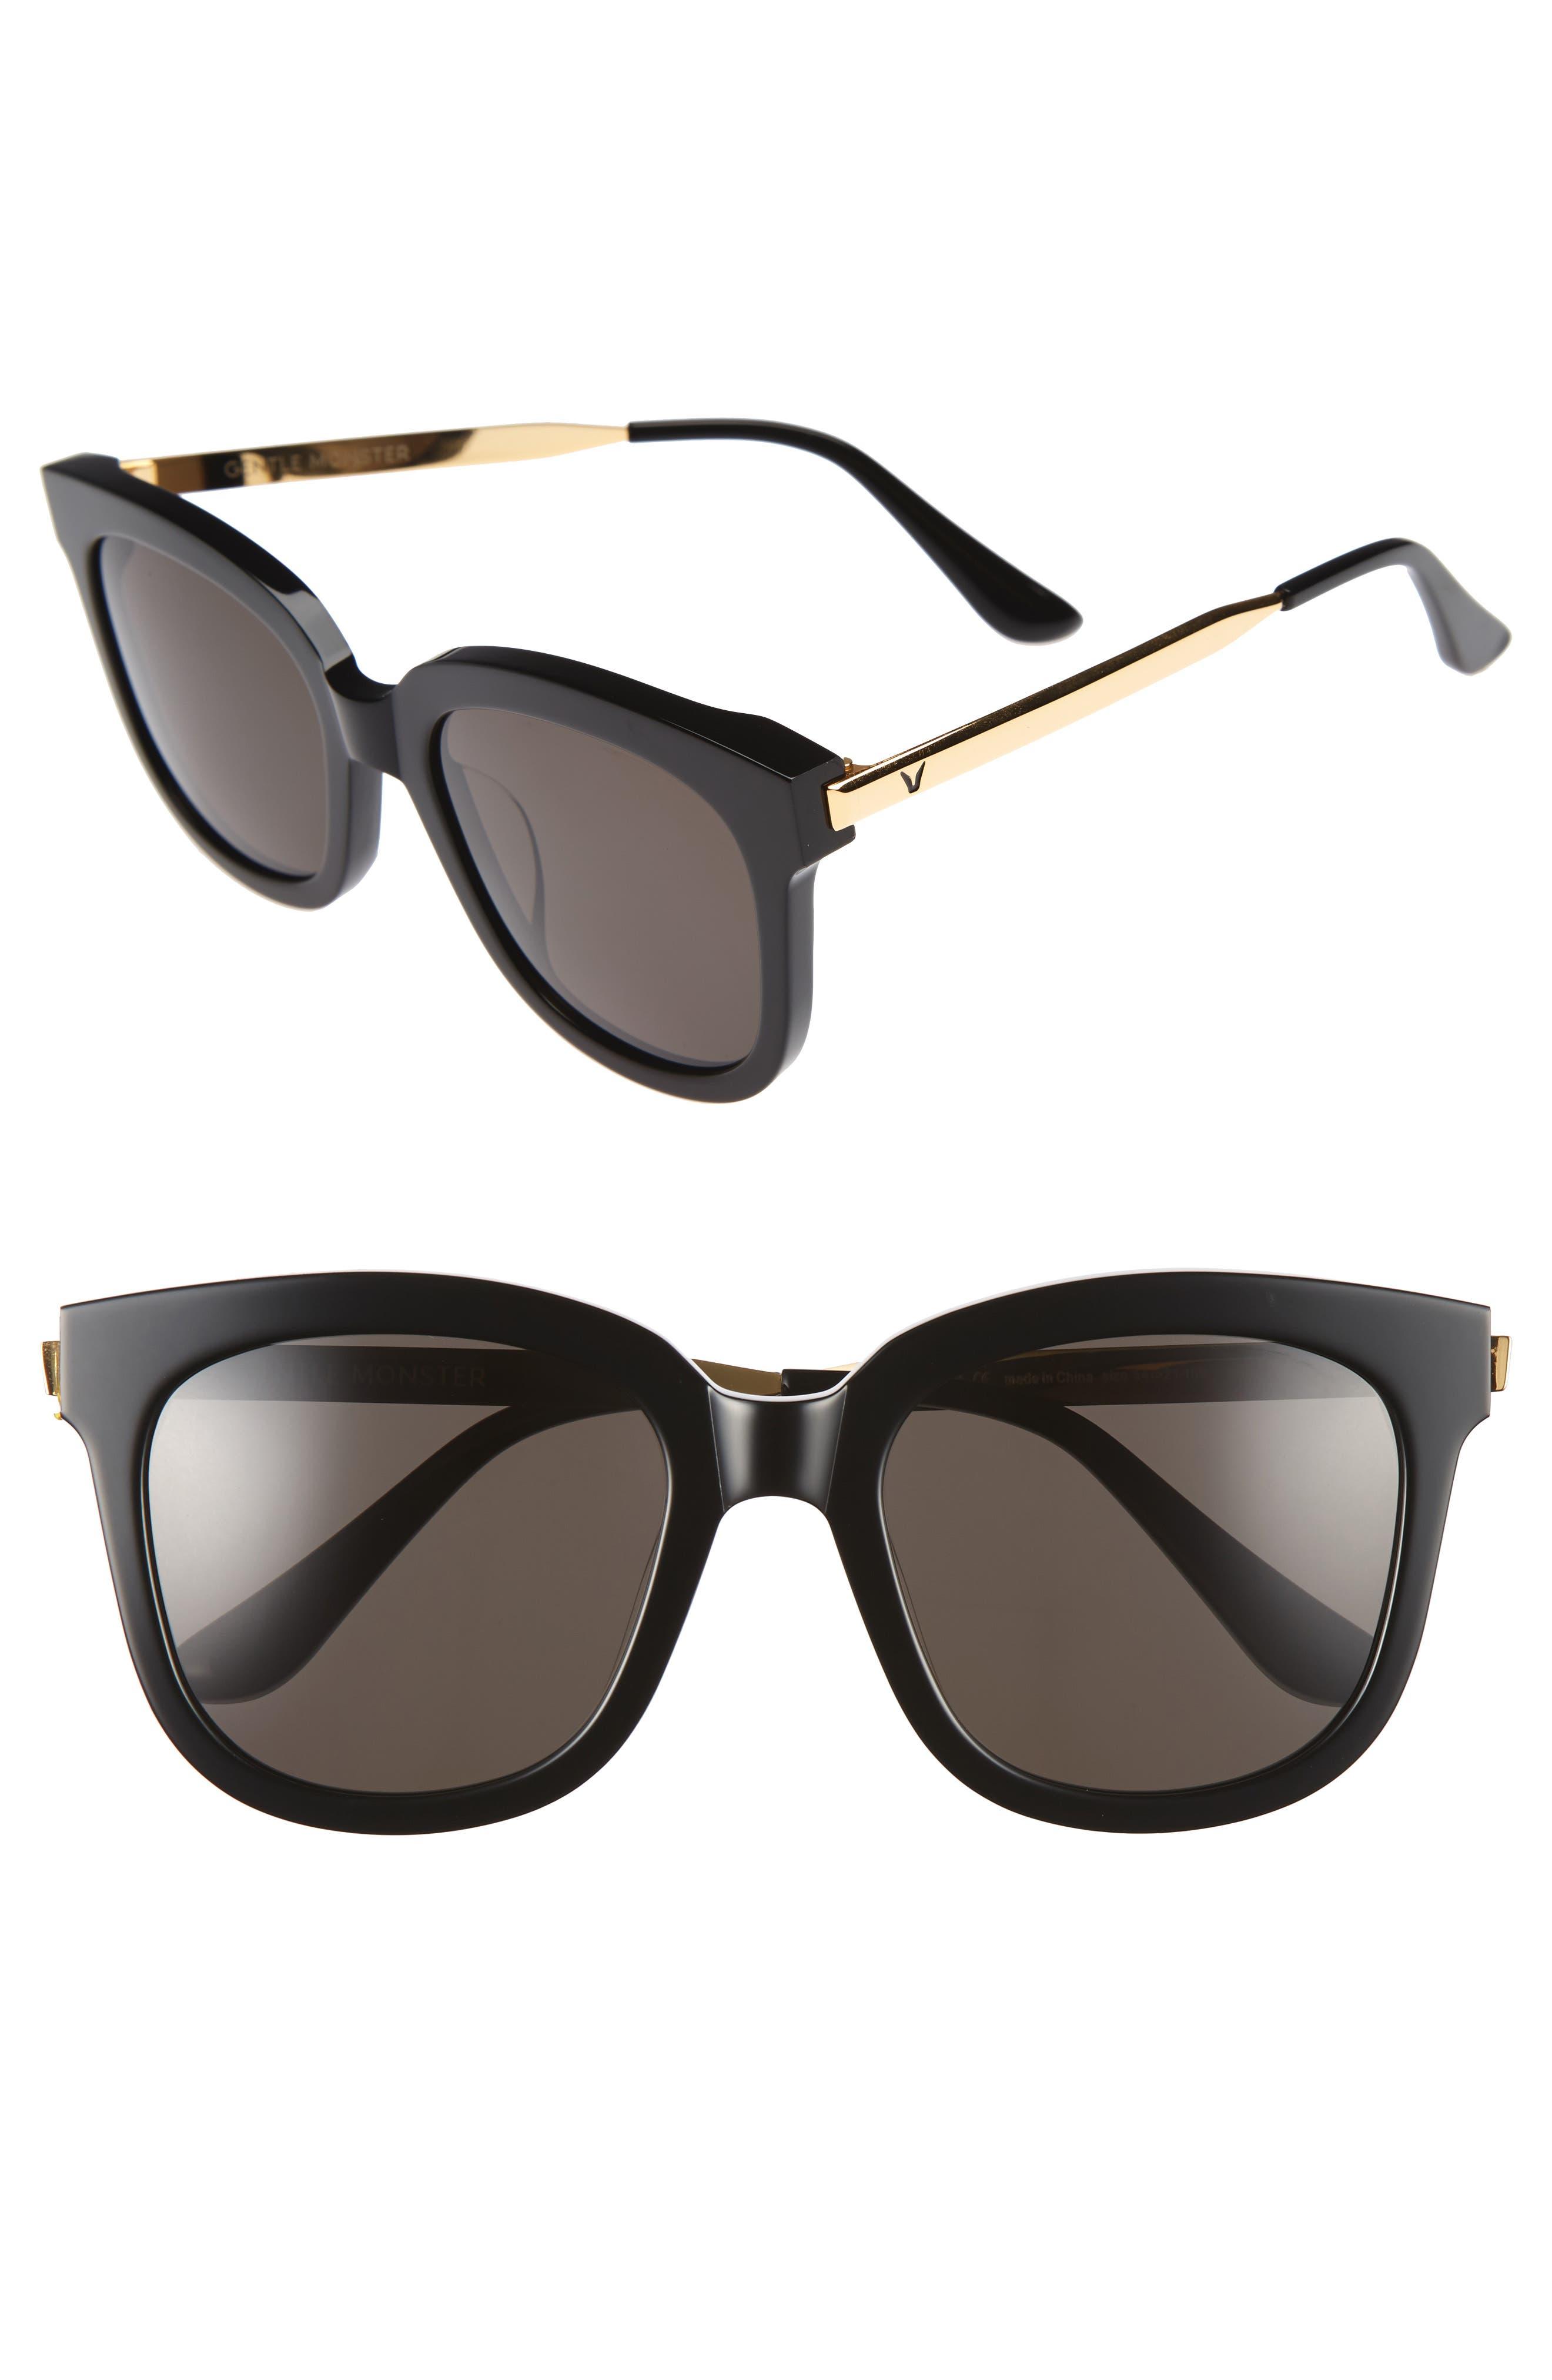 Absente 54mm Sunglasses,                             Alternate thumbnail 3, color,                             001